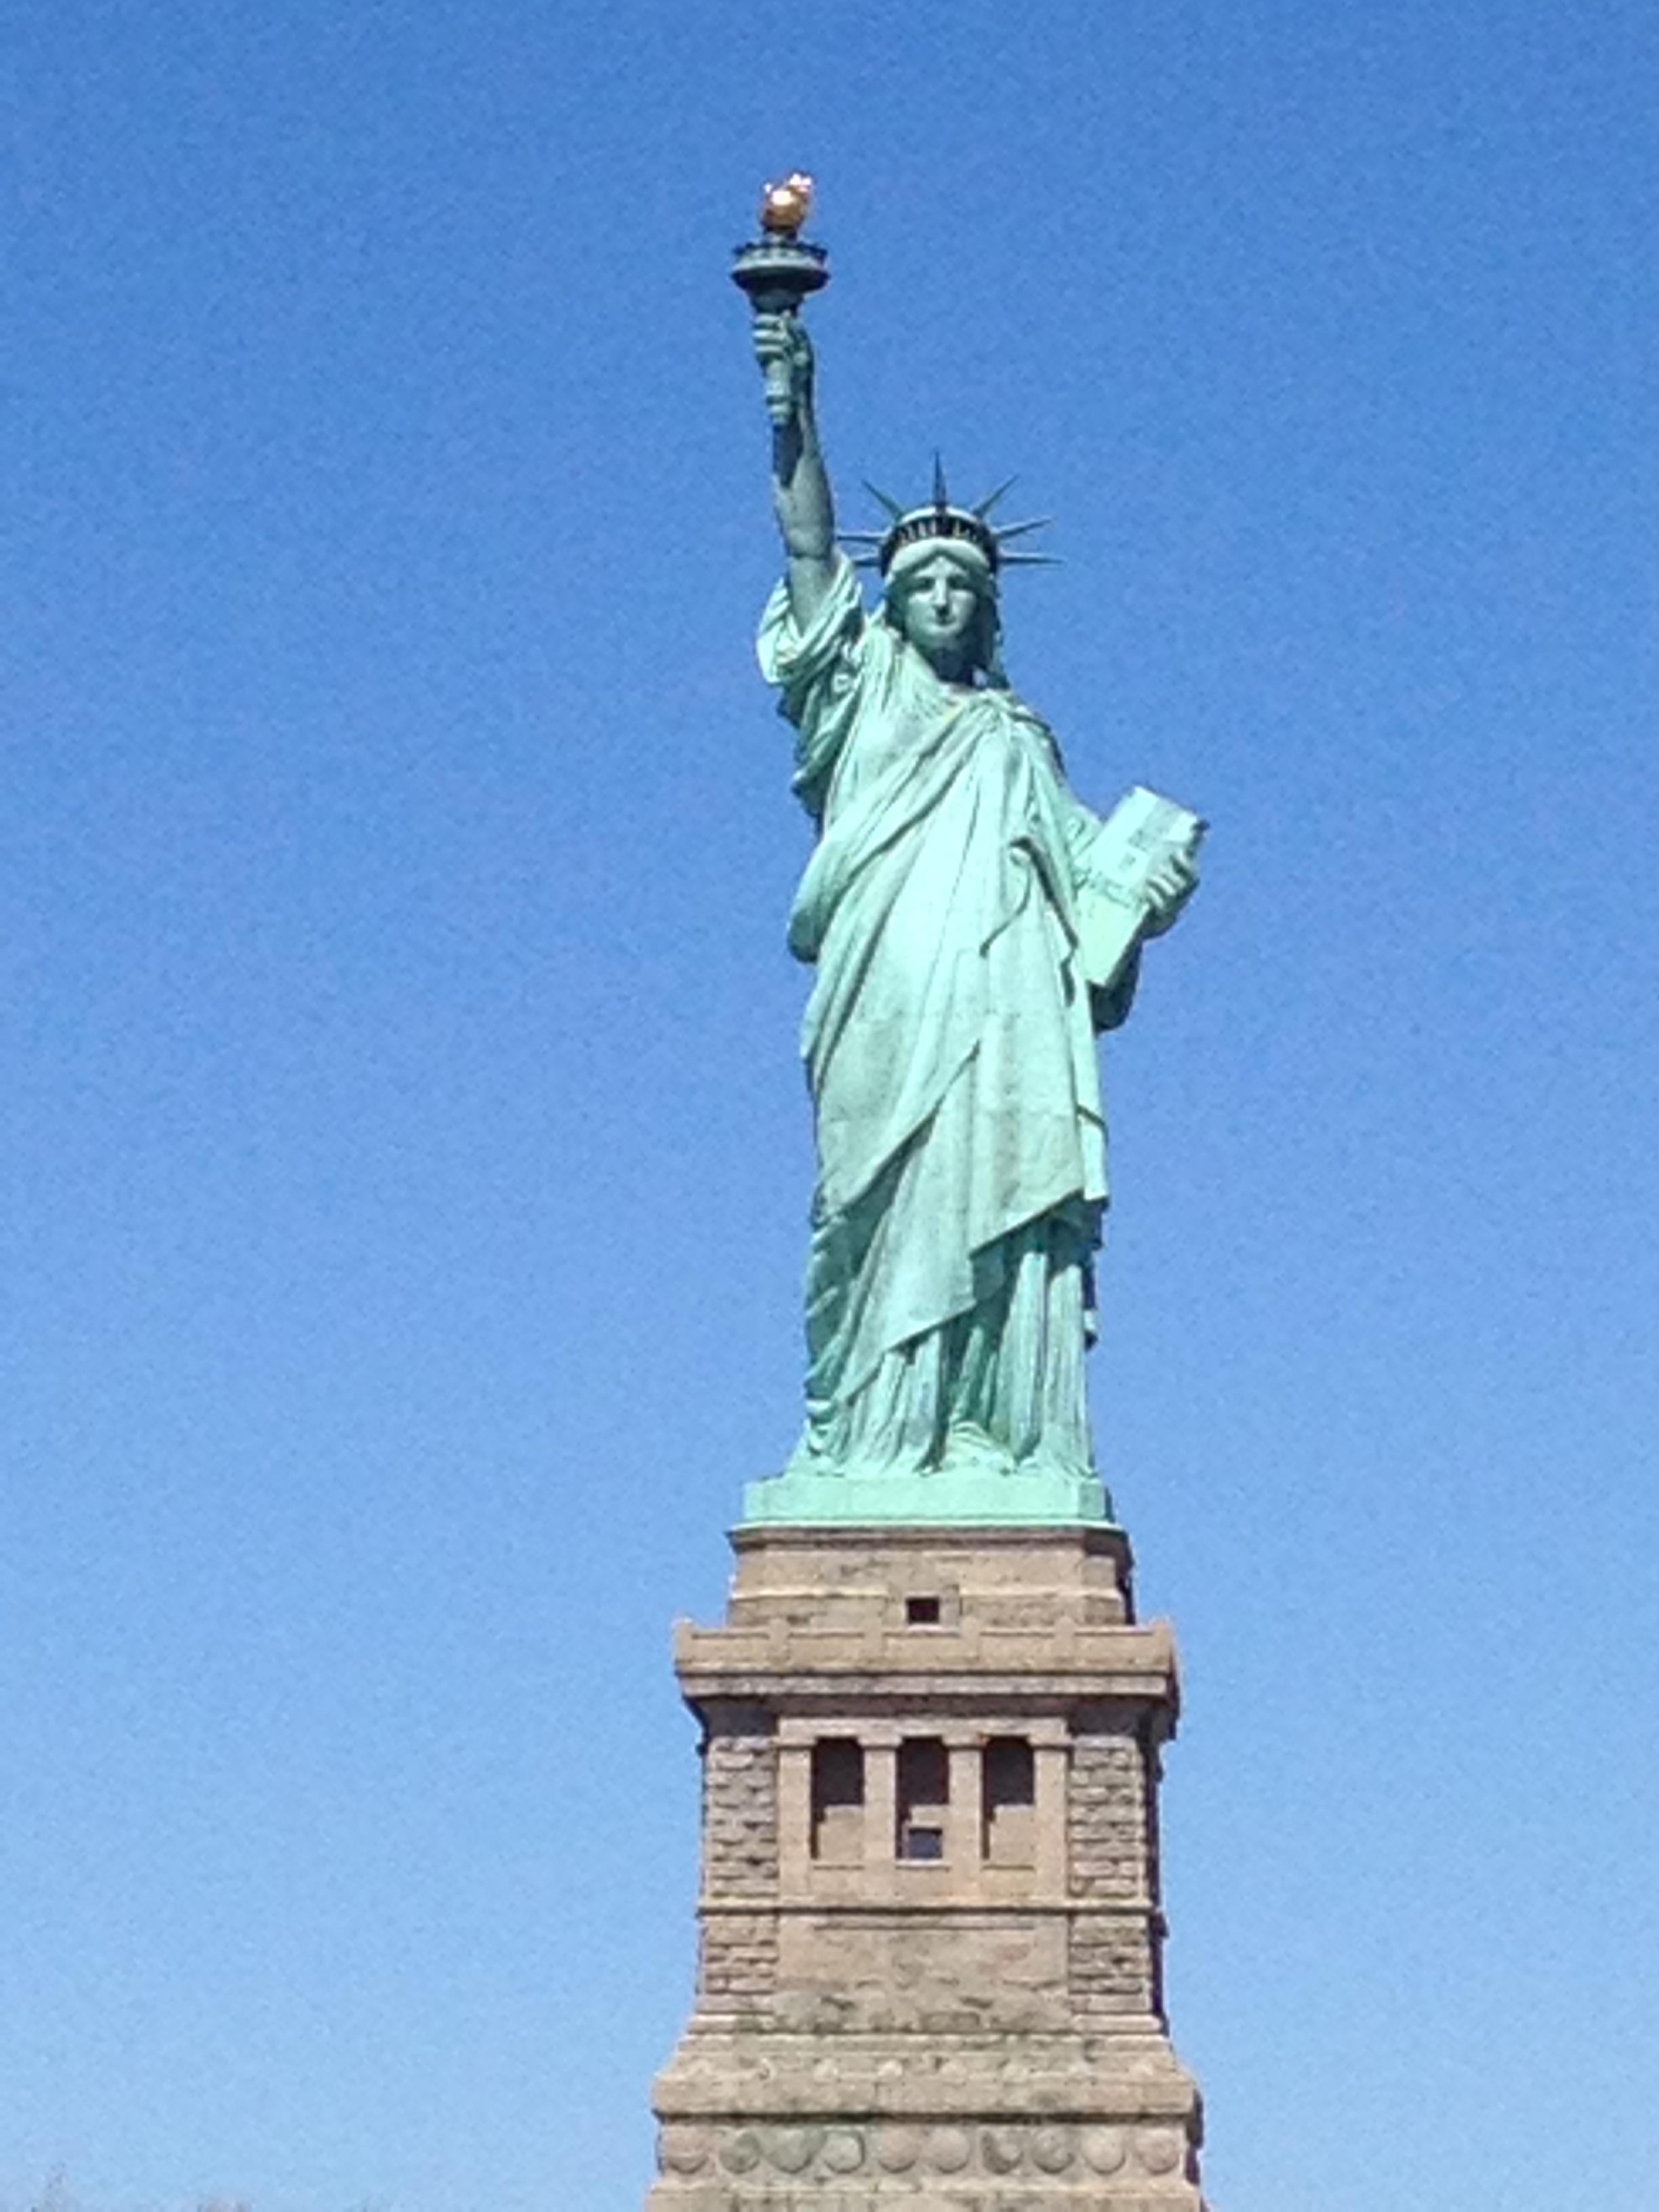 Drawn statue of liberty libert Liberty Torch Of Up Gallery